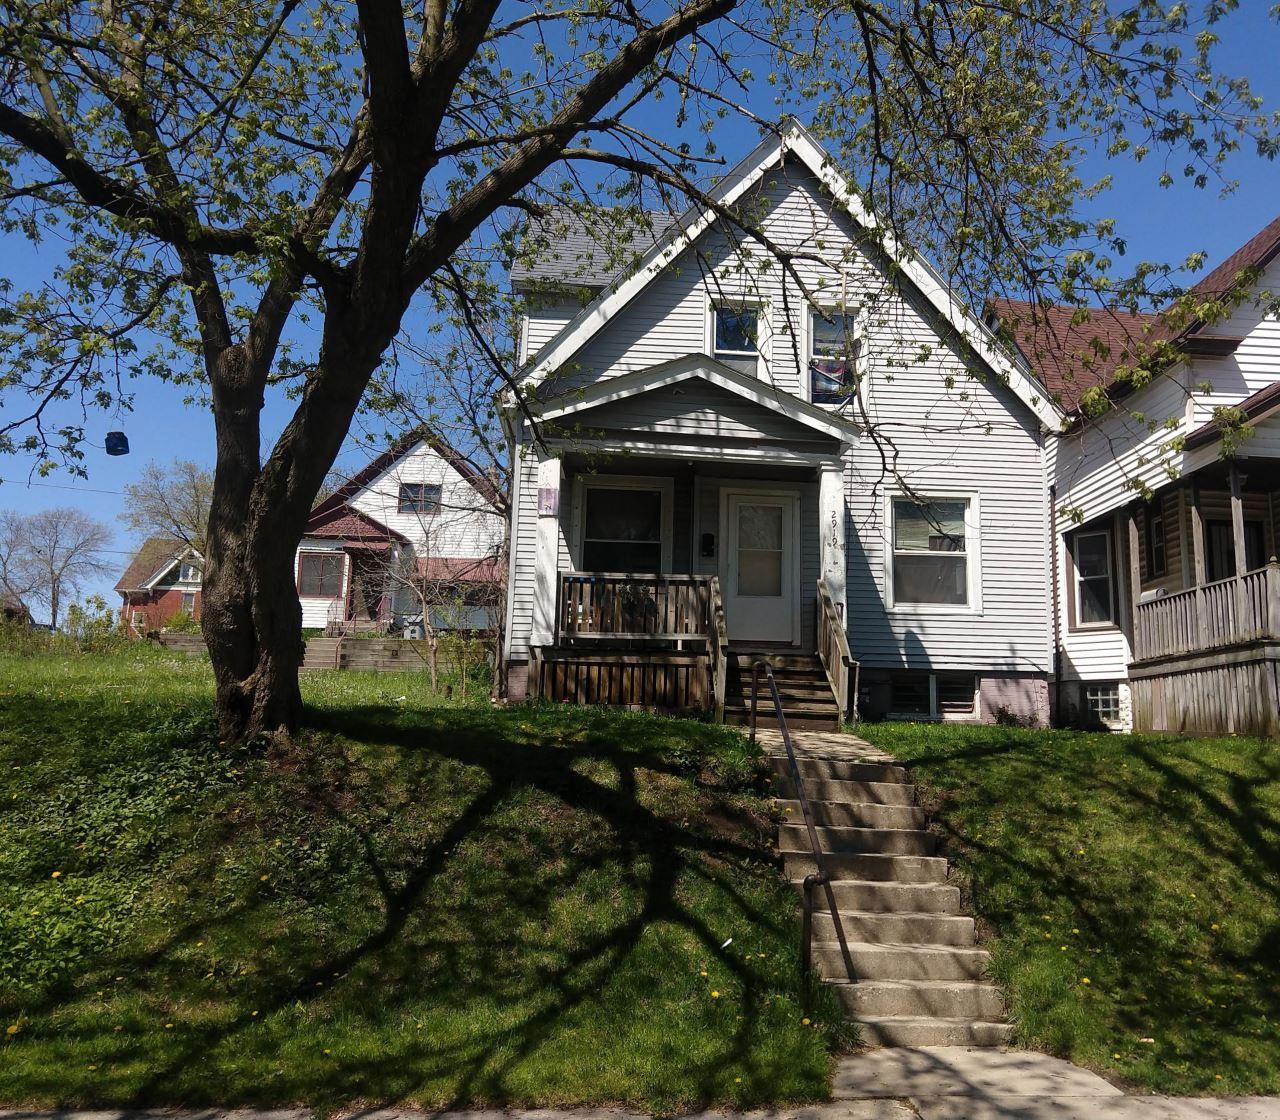 2919 N Palmer St, Milwaukee, WI 53212 - #: 1690069